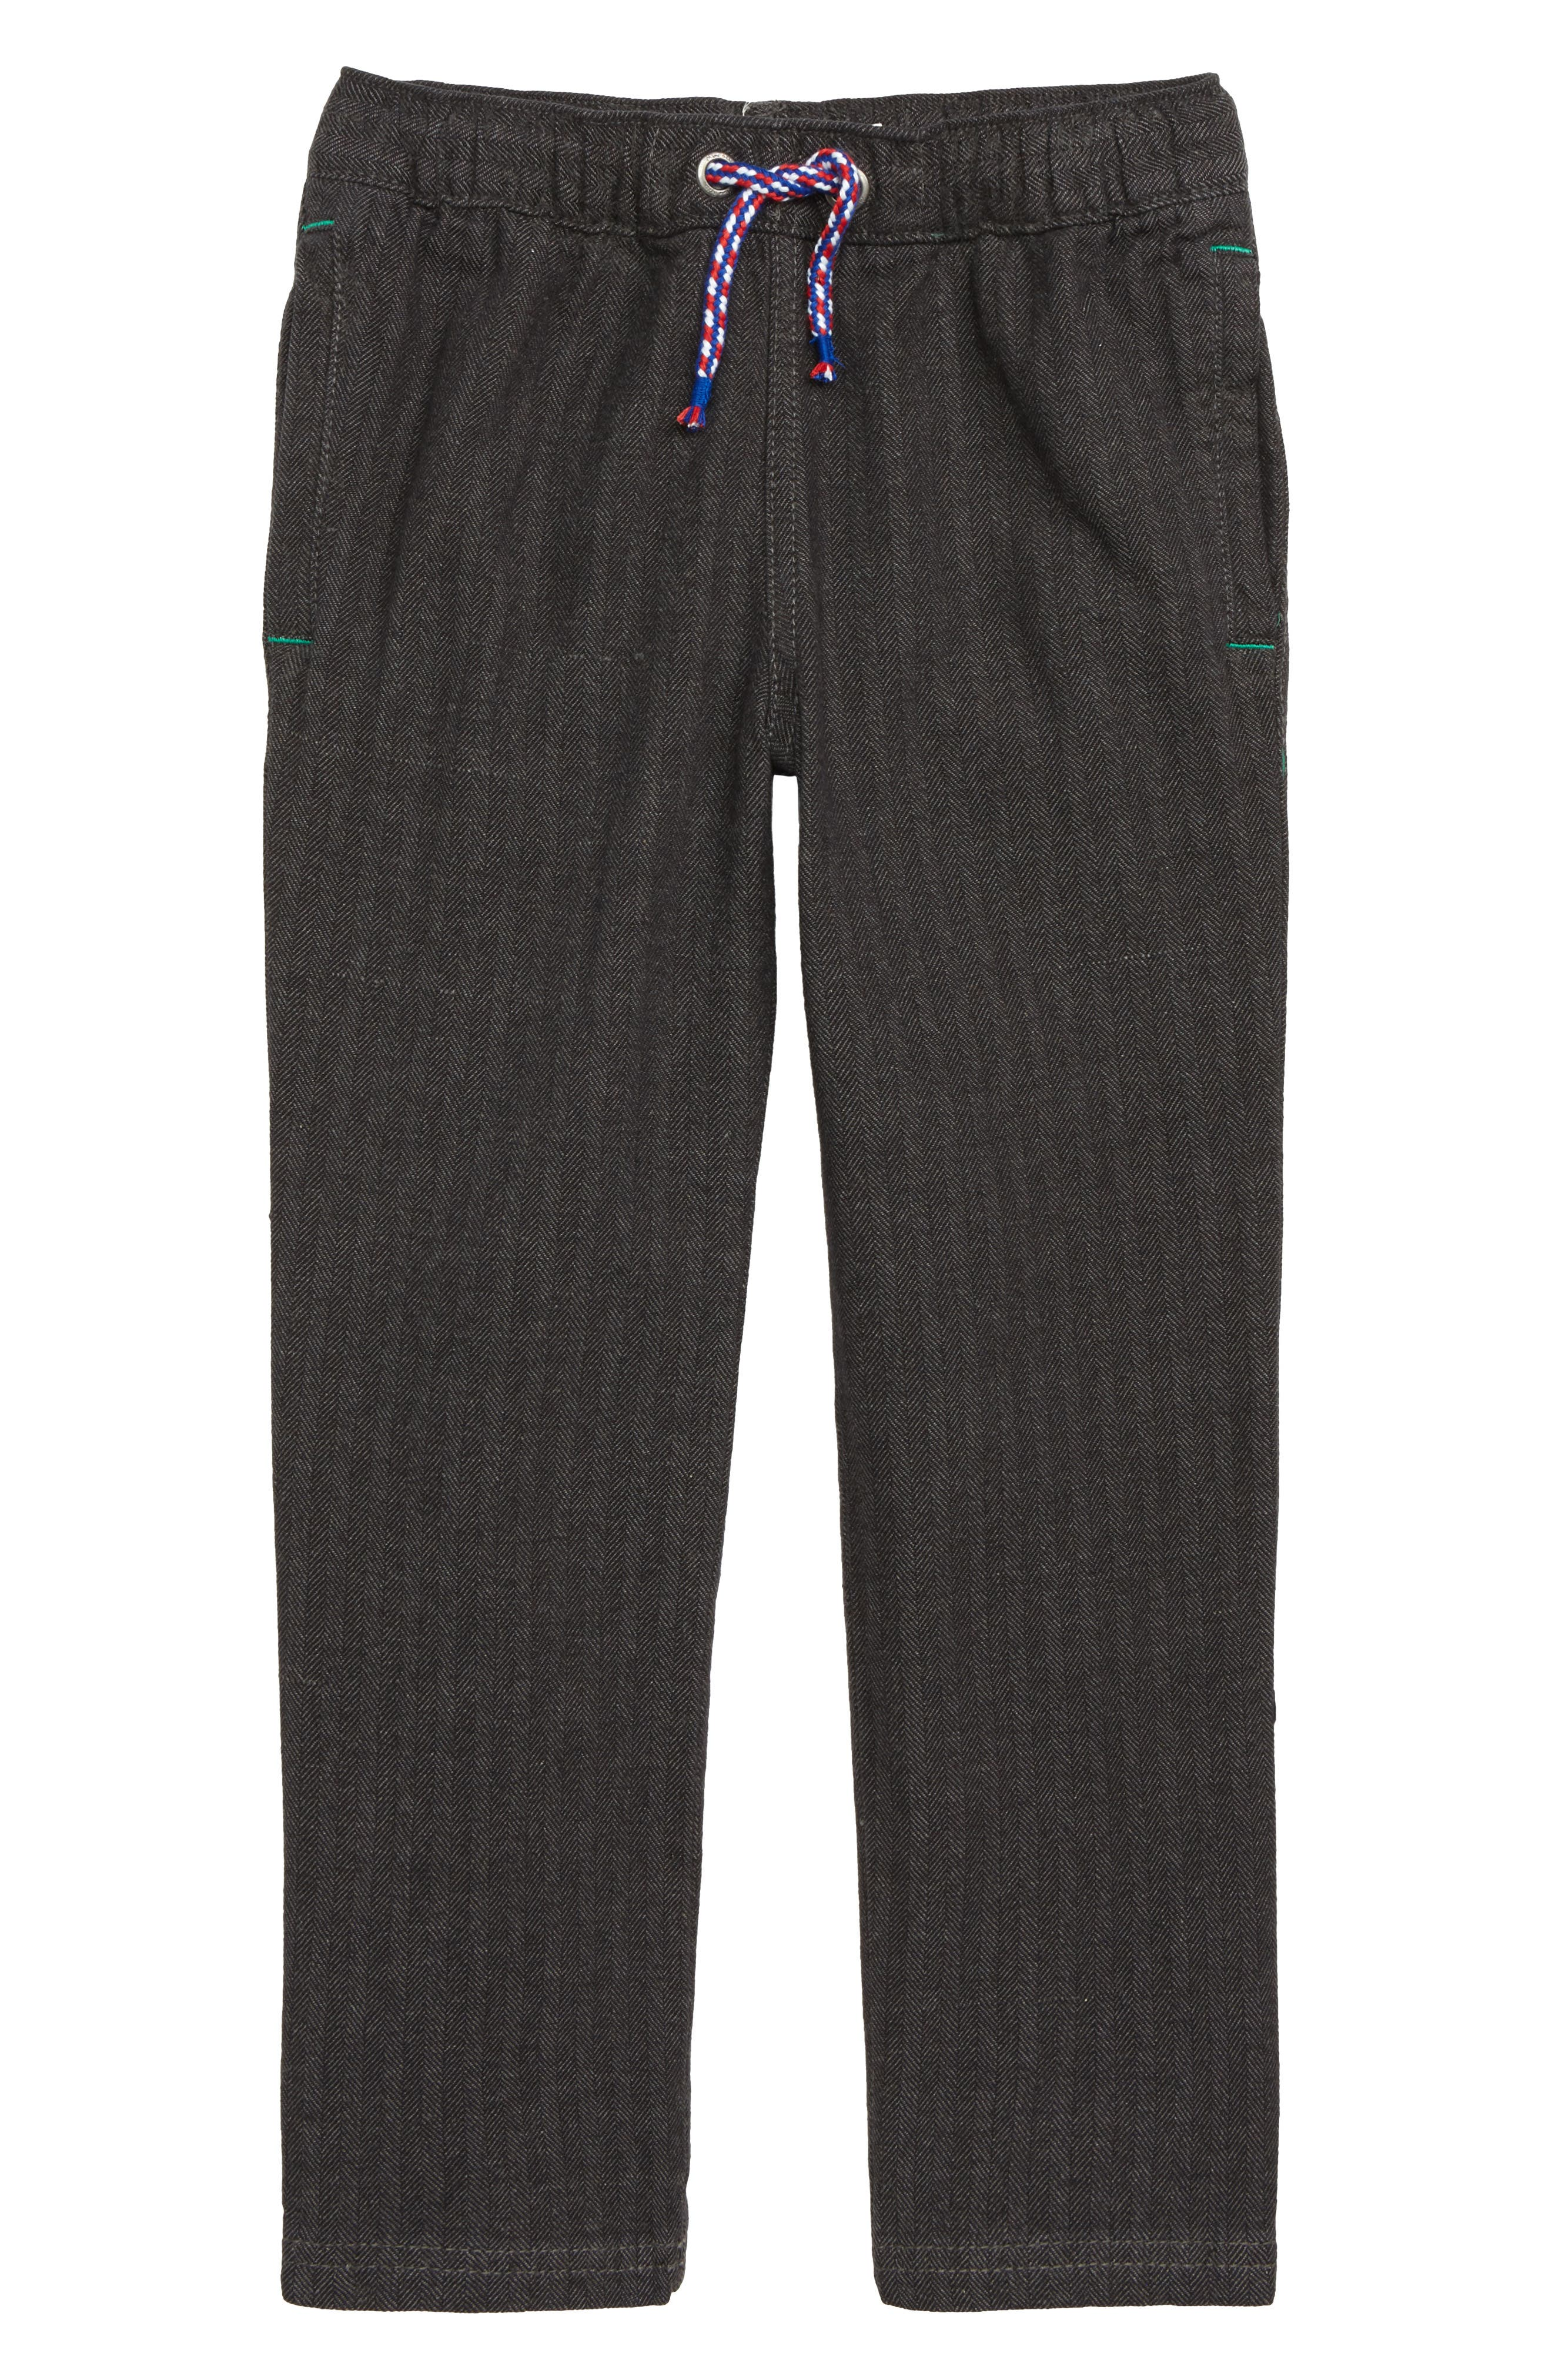 Smart Pull-On Pants,                         Main,                         color, GRY GREY HERRINGBONE